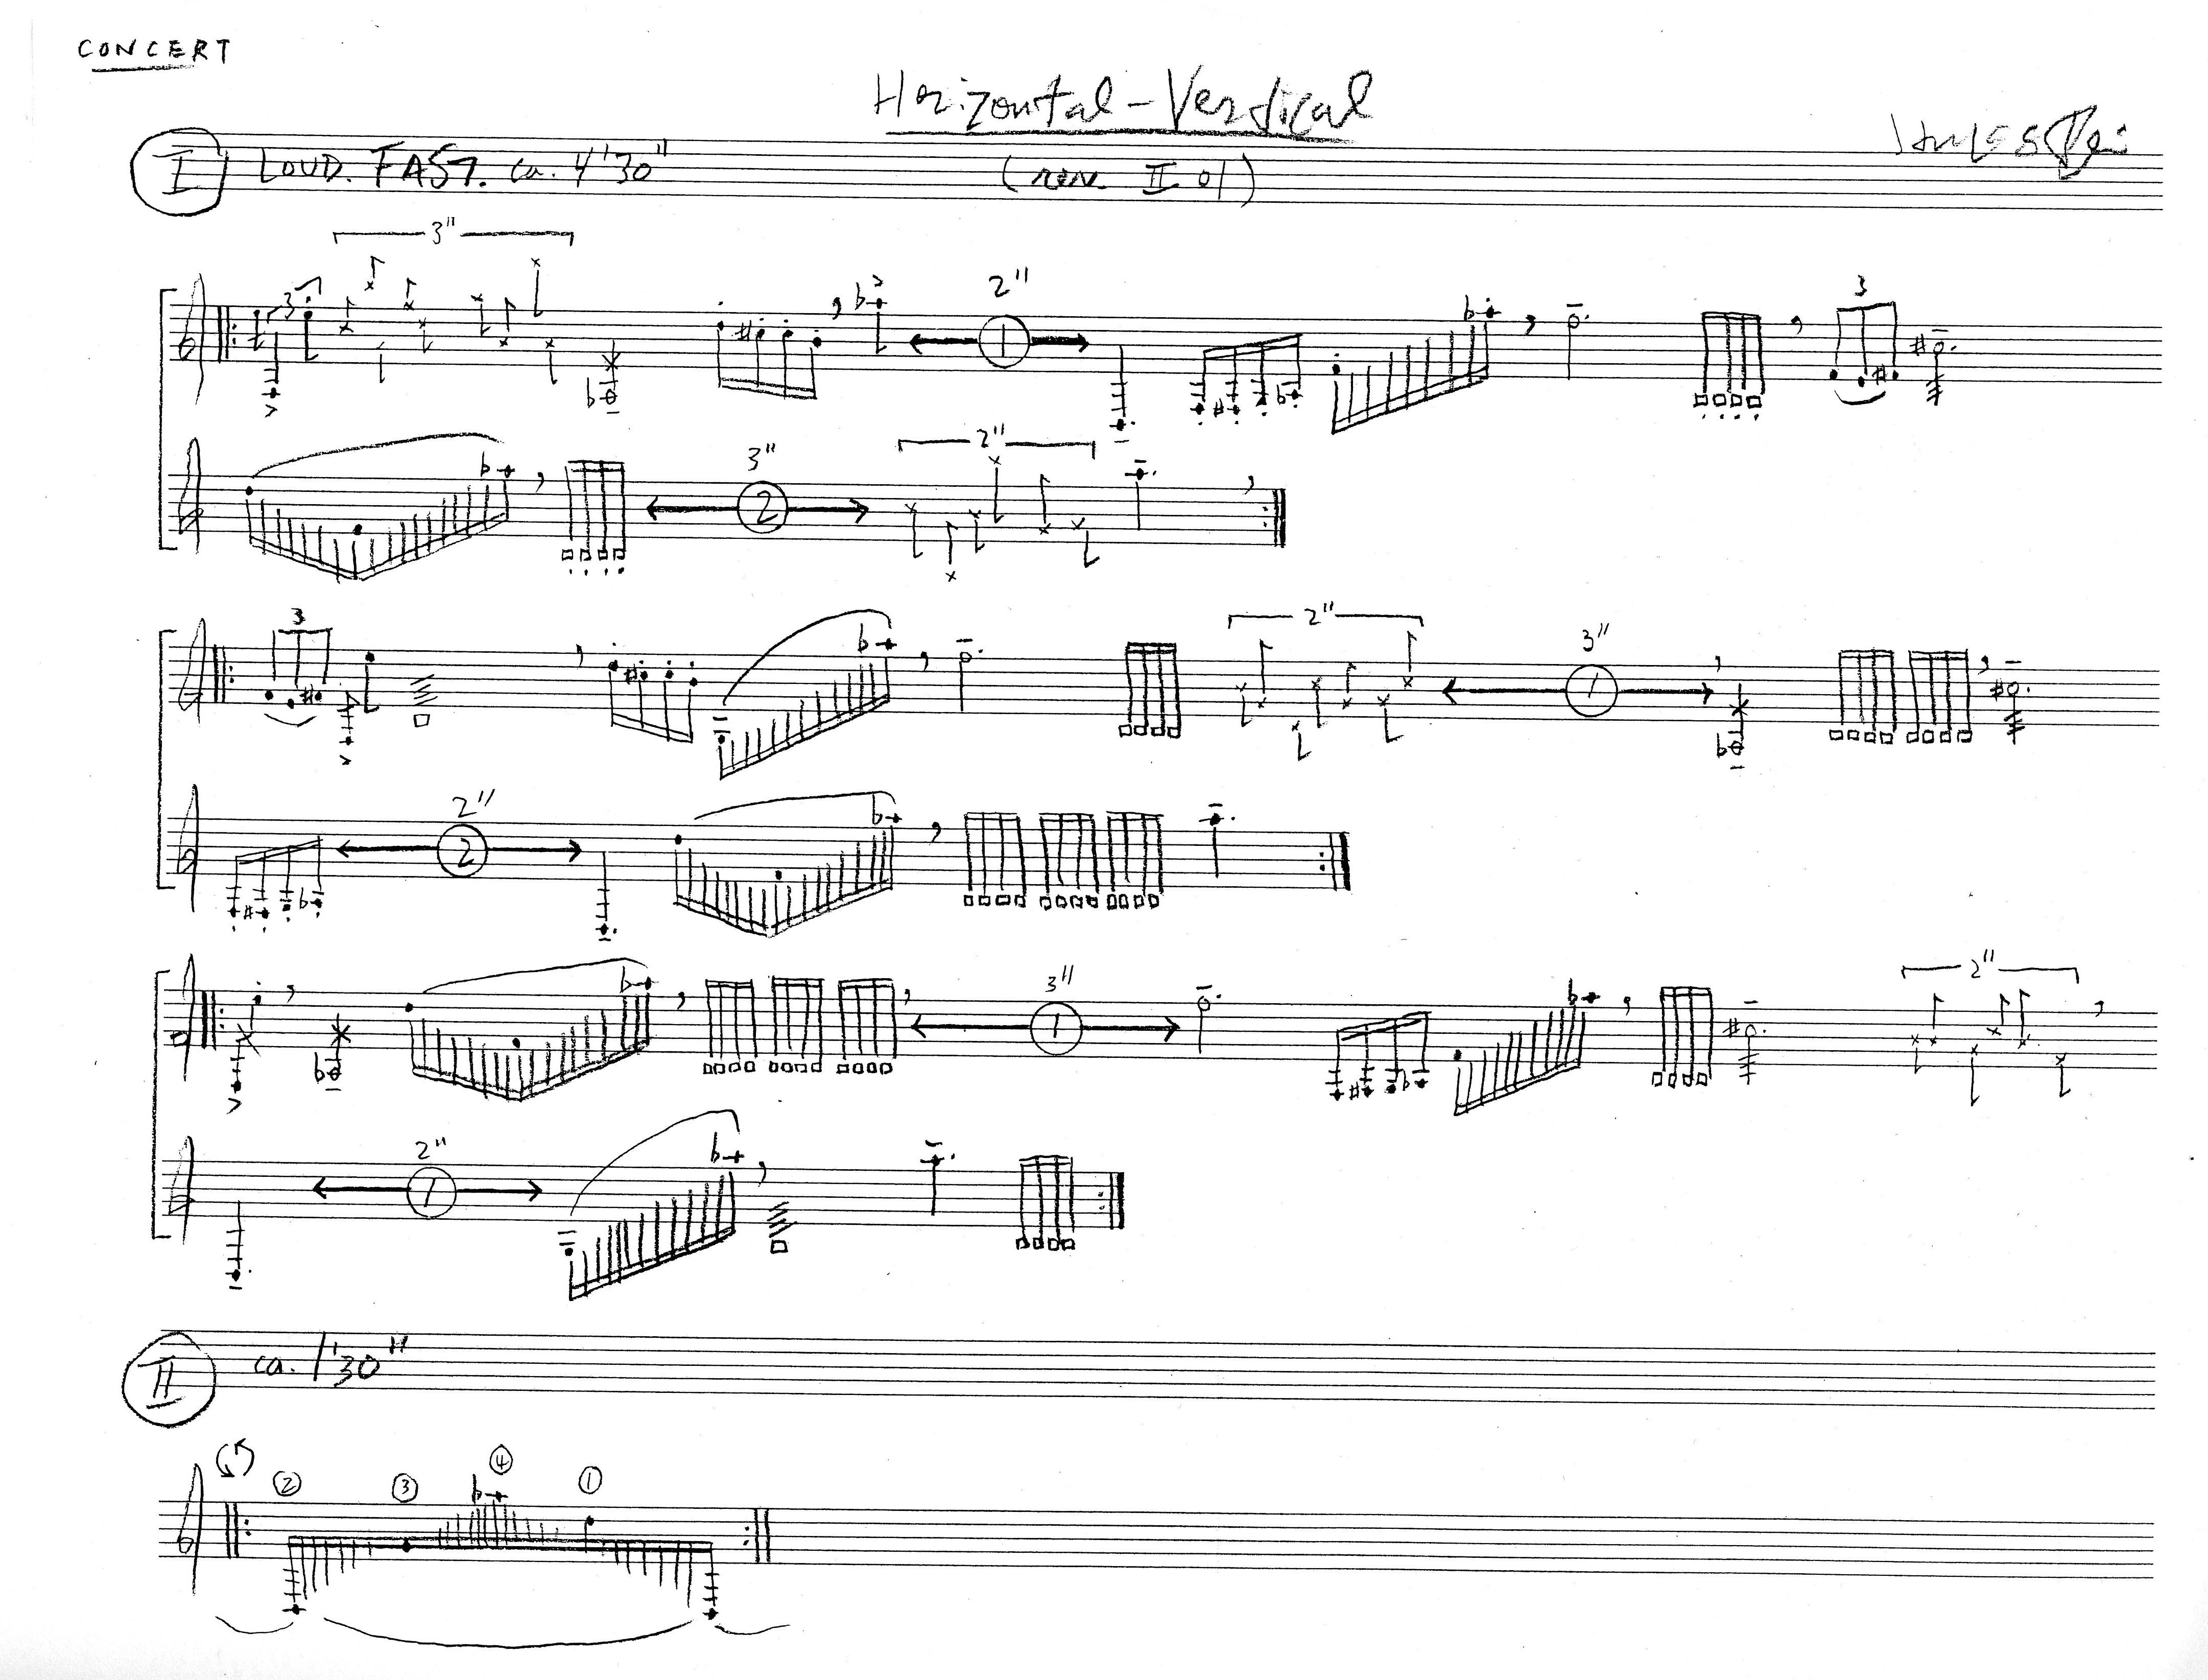 James Fei Score